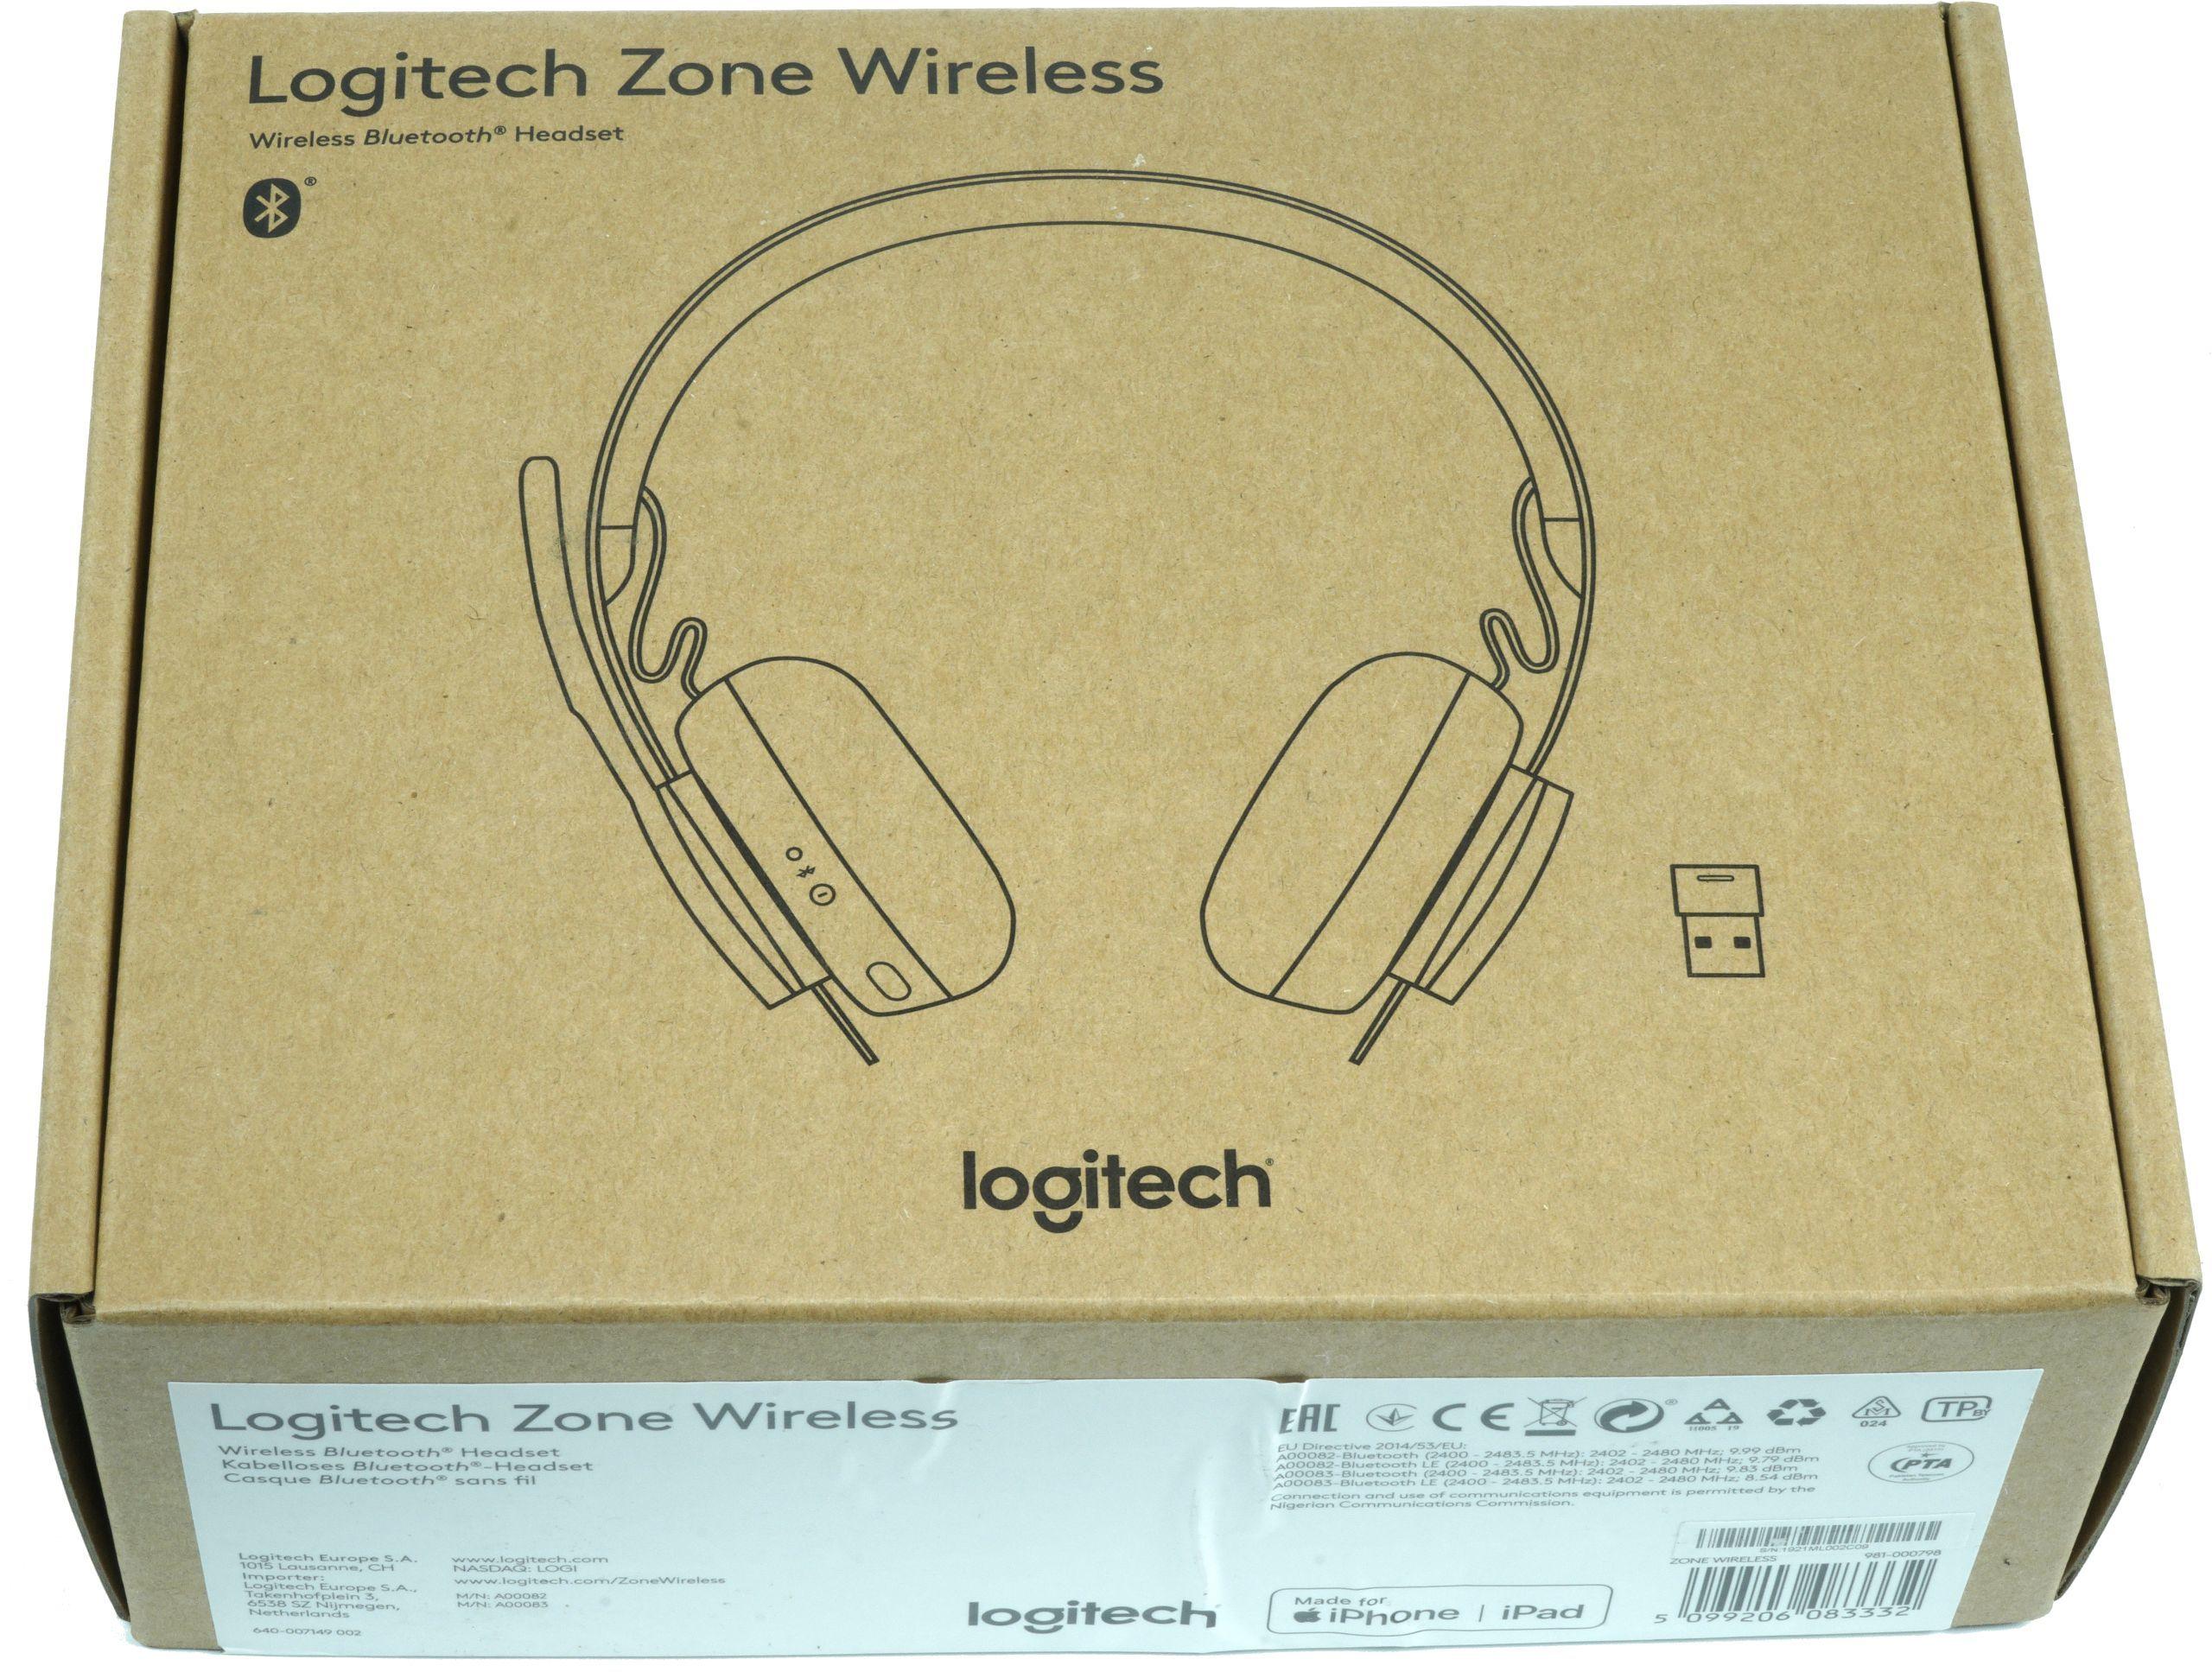 Logitech Zone Wireless Headset Home Office Without Headaches Igor Slab